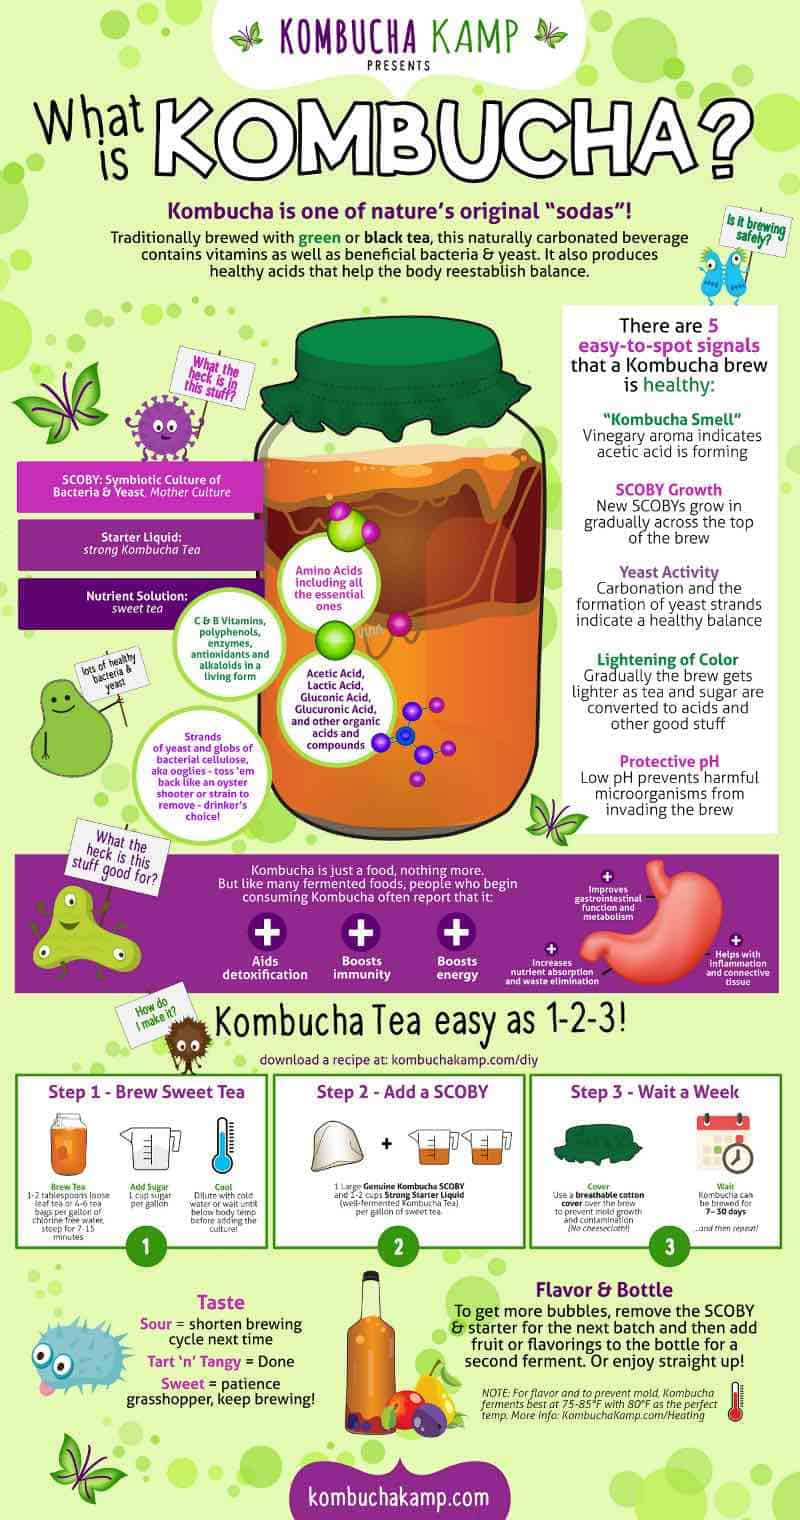 kombucha: what is it? infographic